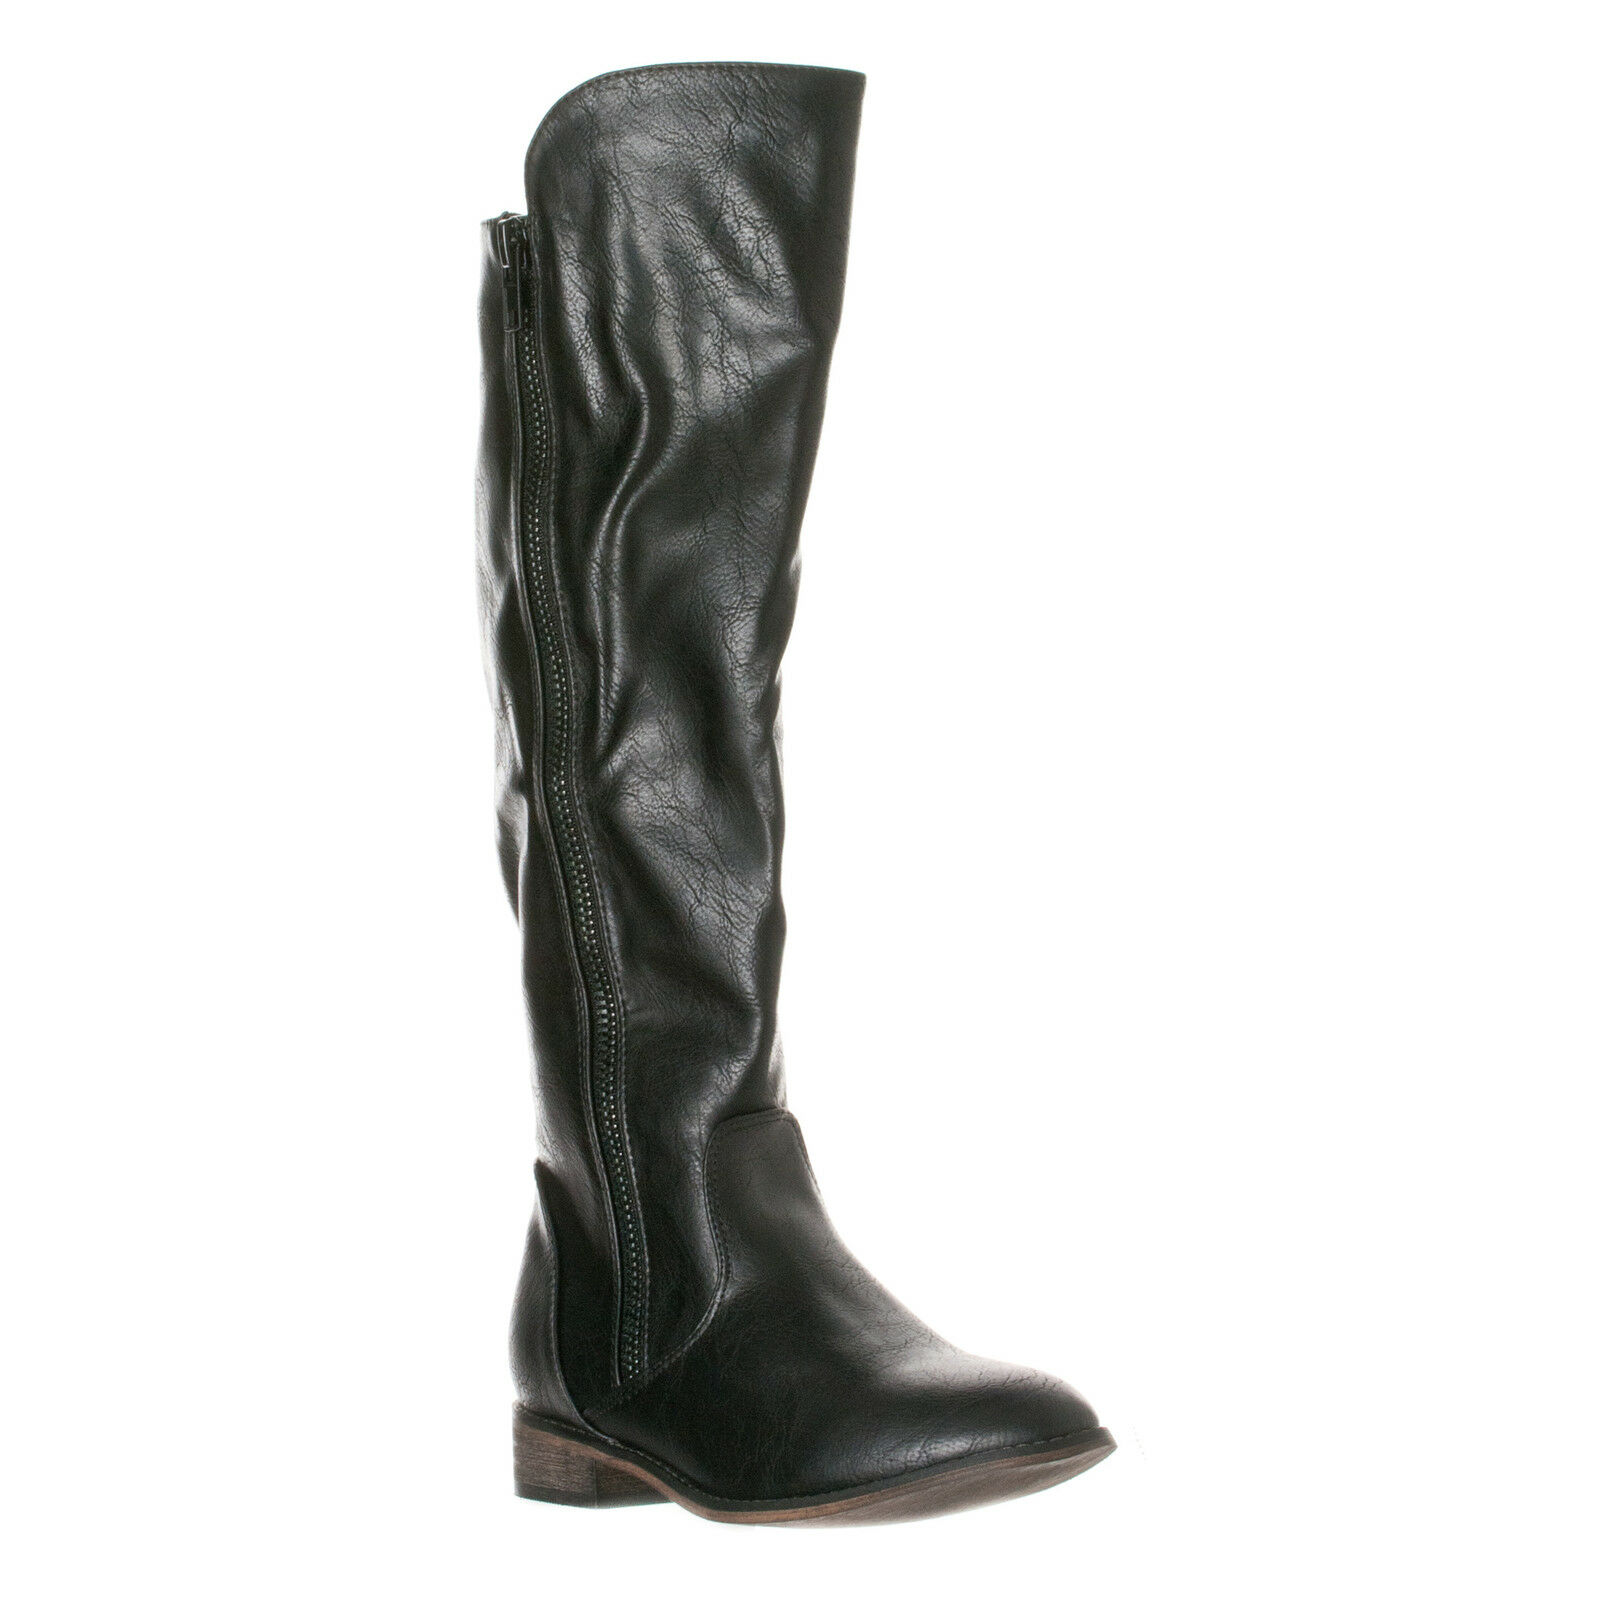 Breckelle's Women's Clayton-12 Zipper Riding Knee High Boots